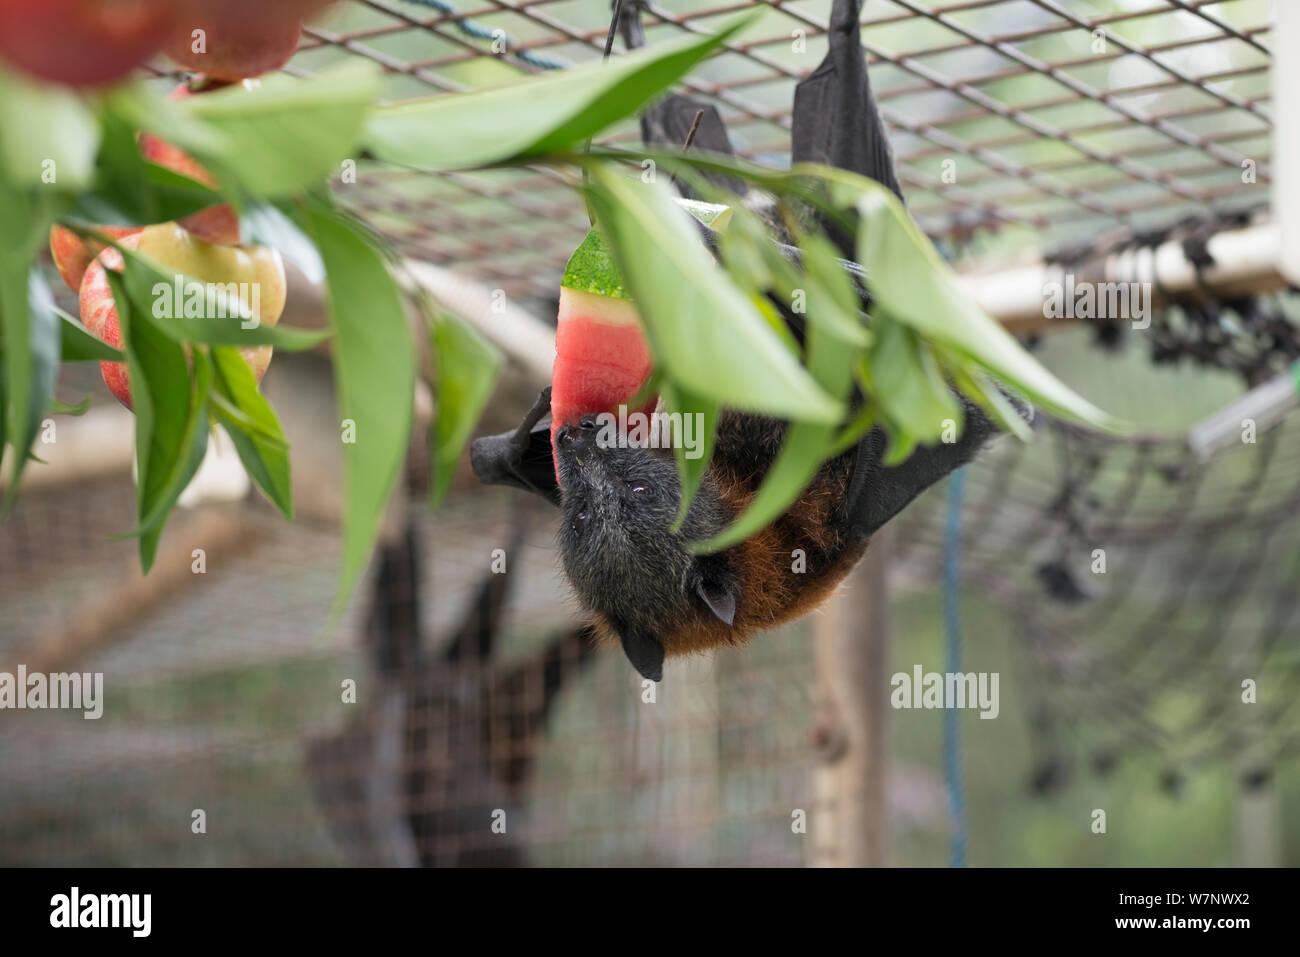 Testa Grigia flying fox (Pteropus poliocephalus) in voliera alimentazione su frutta, Tolga Bat Hospital, North Queensland, Australia, Novembre 2012 Foto Stock